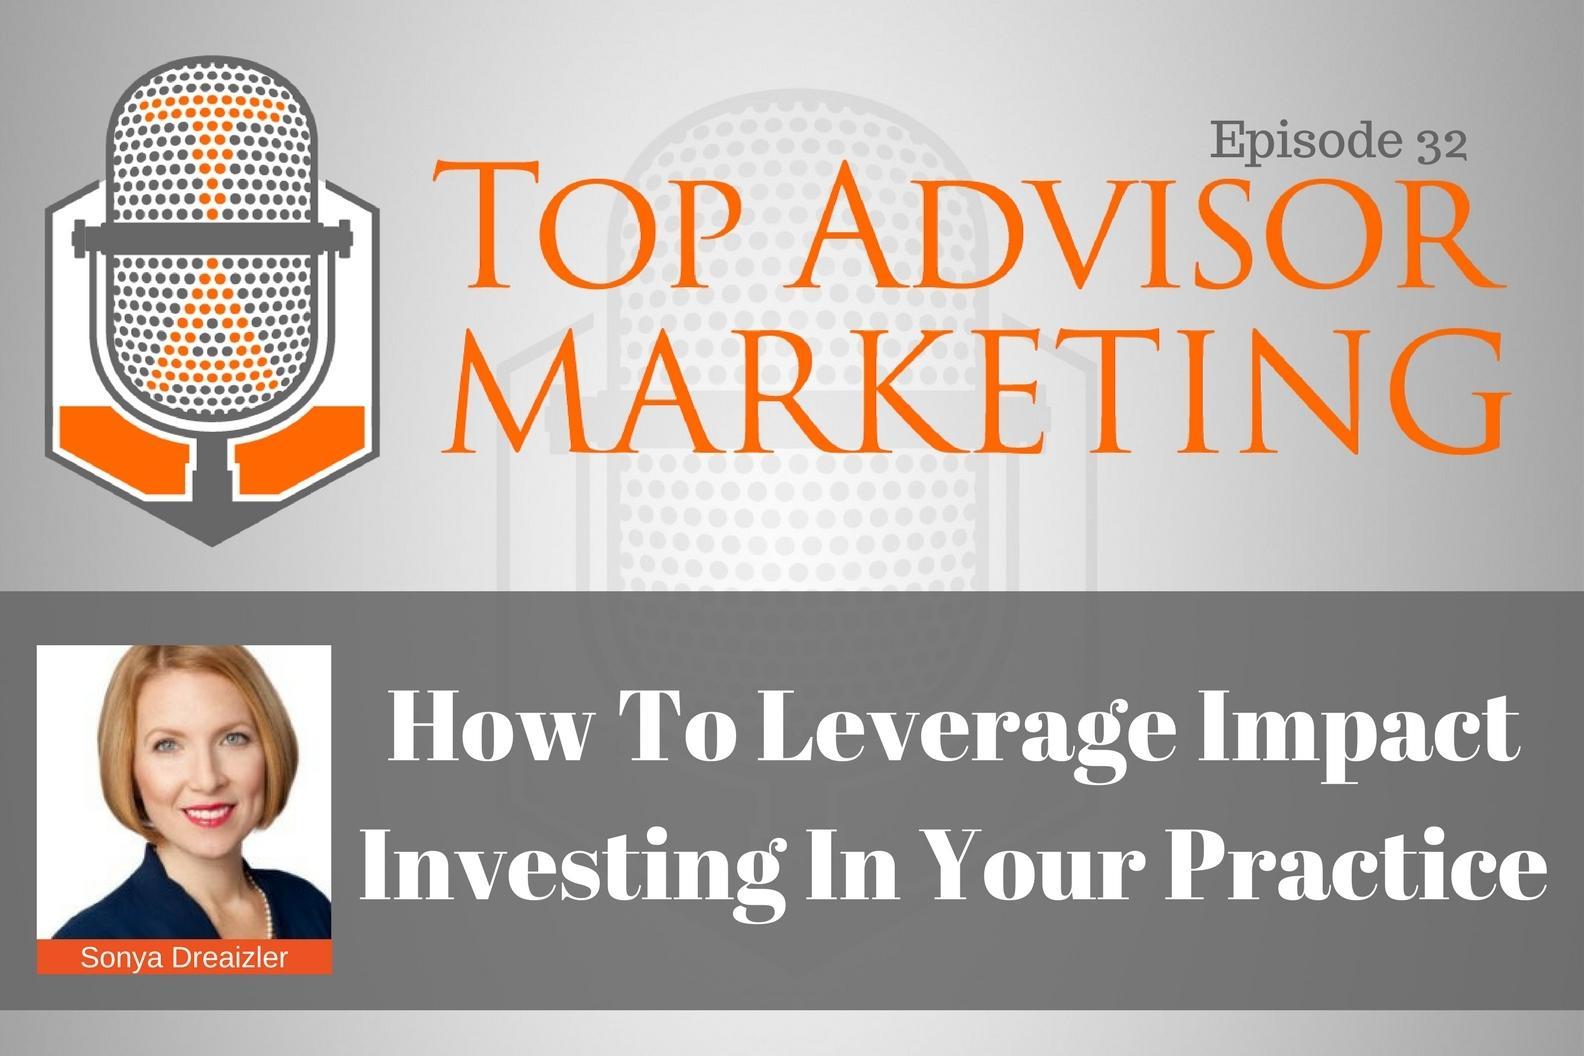 Top Advisor Marketing.jpeg